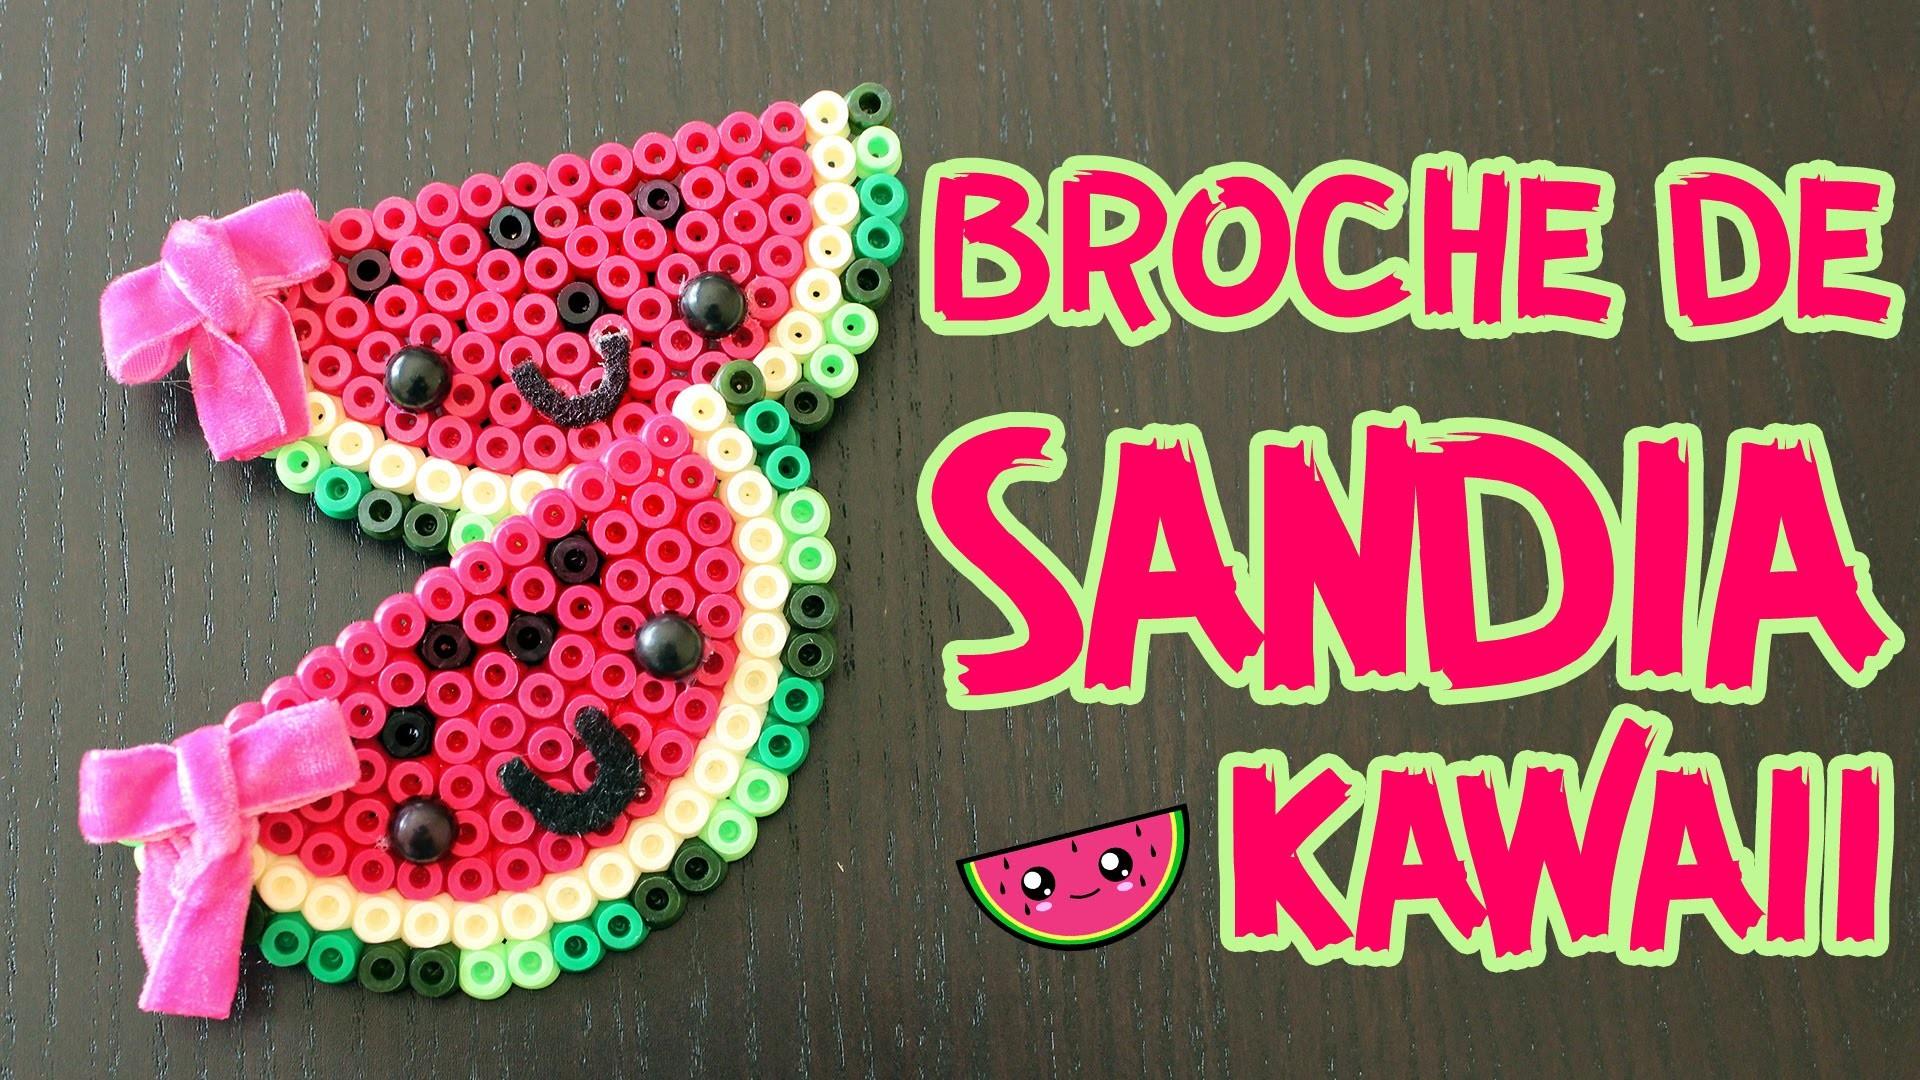 Broche sandía en Píxel Art  (Manualidades fáciles con hama beads)